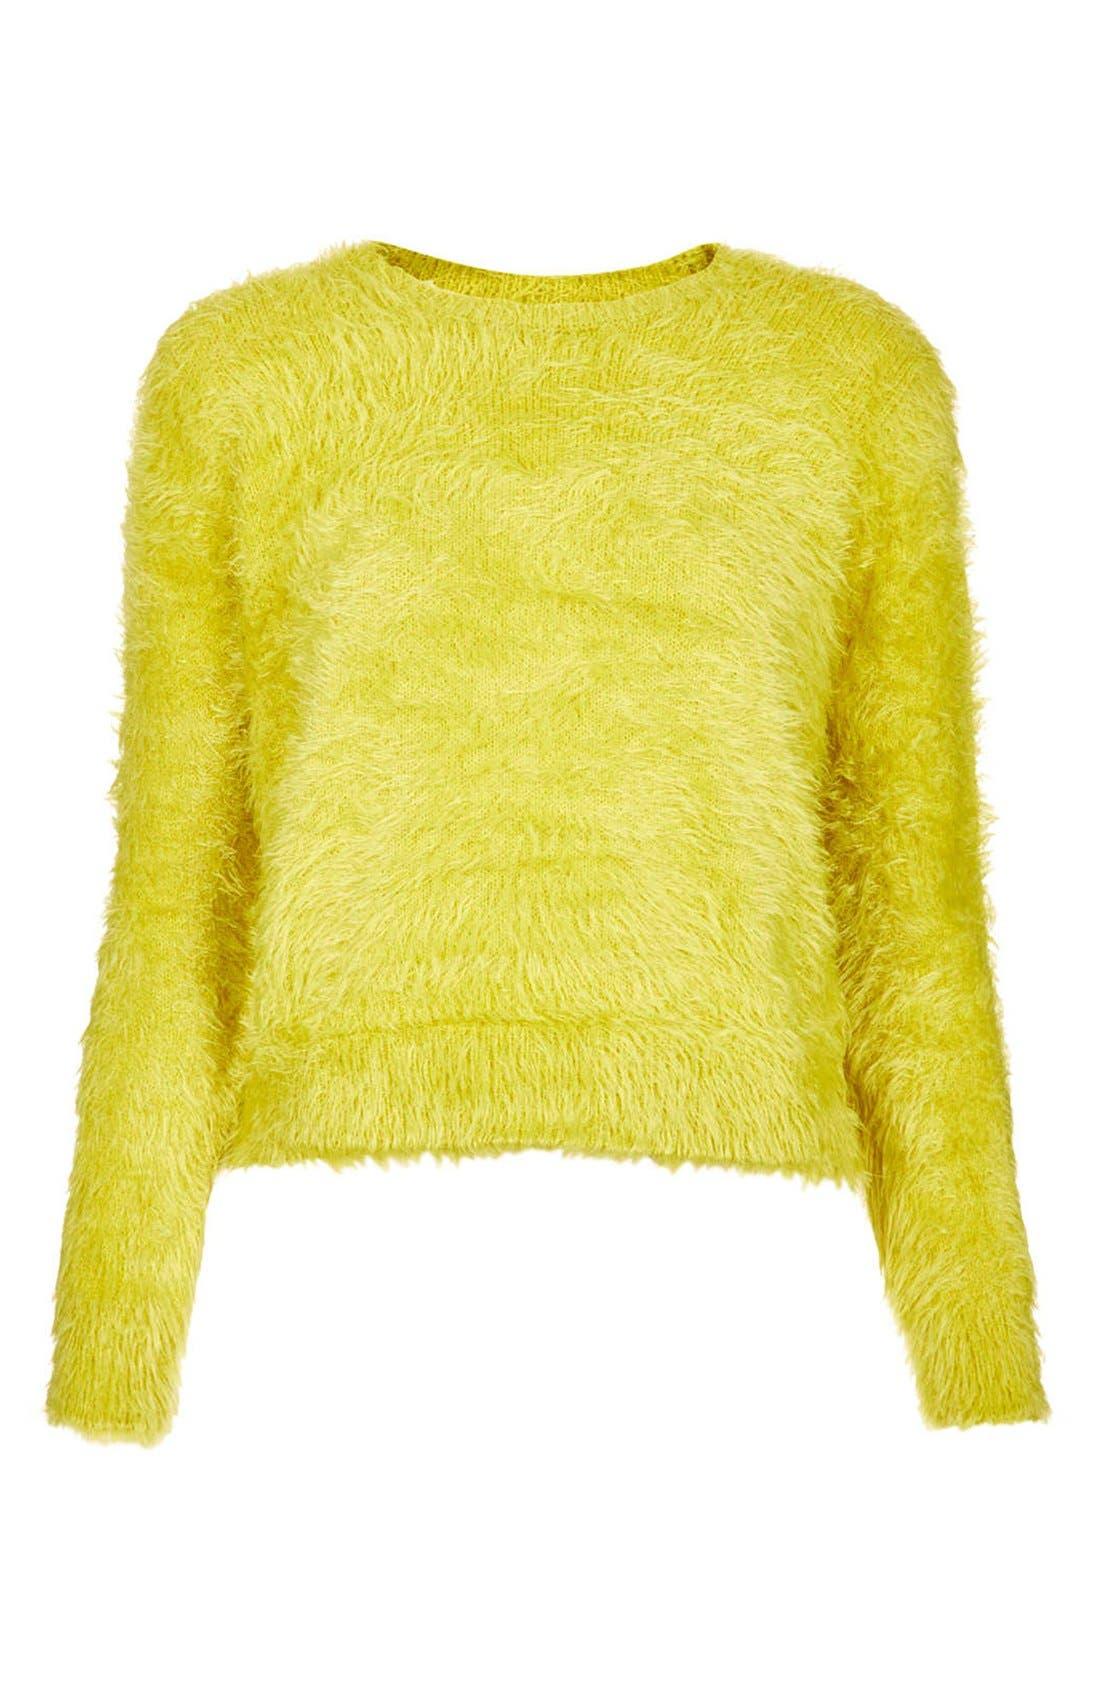 Alternate Image 3  - Topshop Textured Crewneck Sweater (Petite)